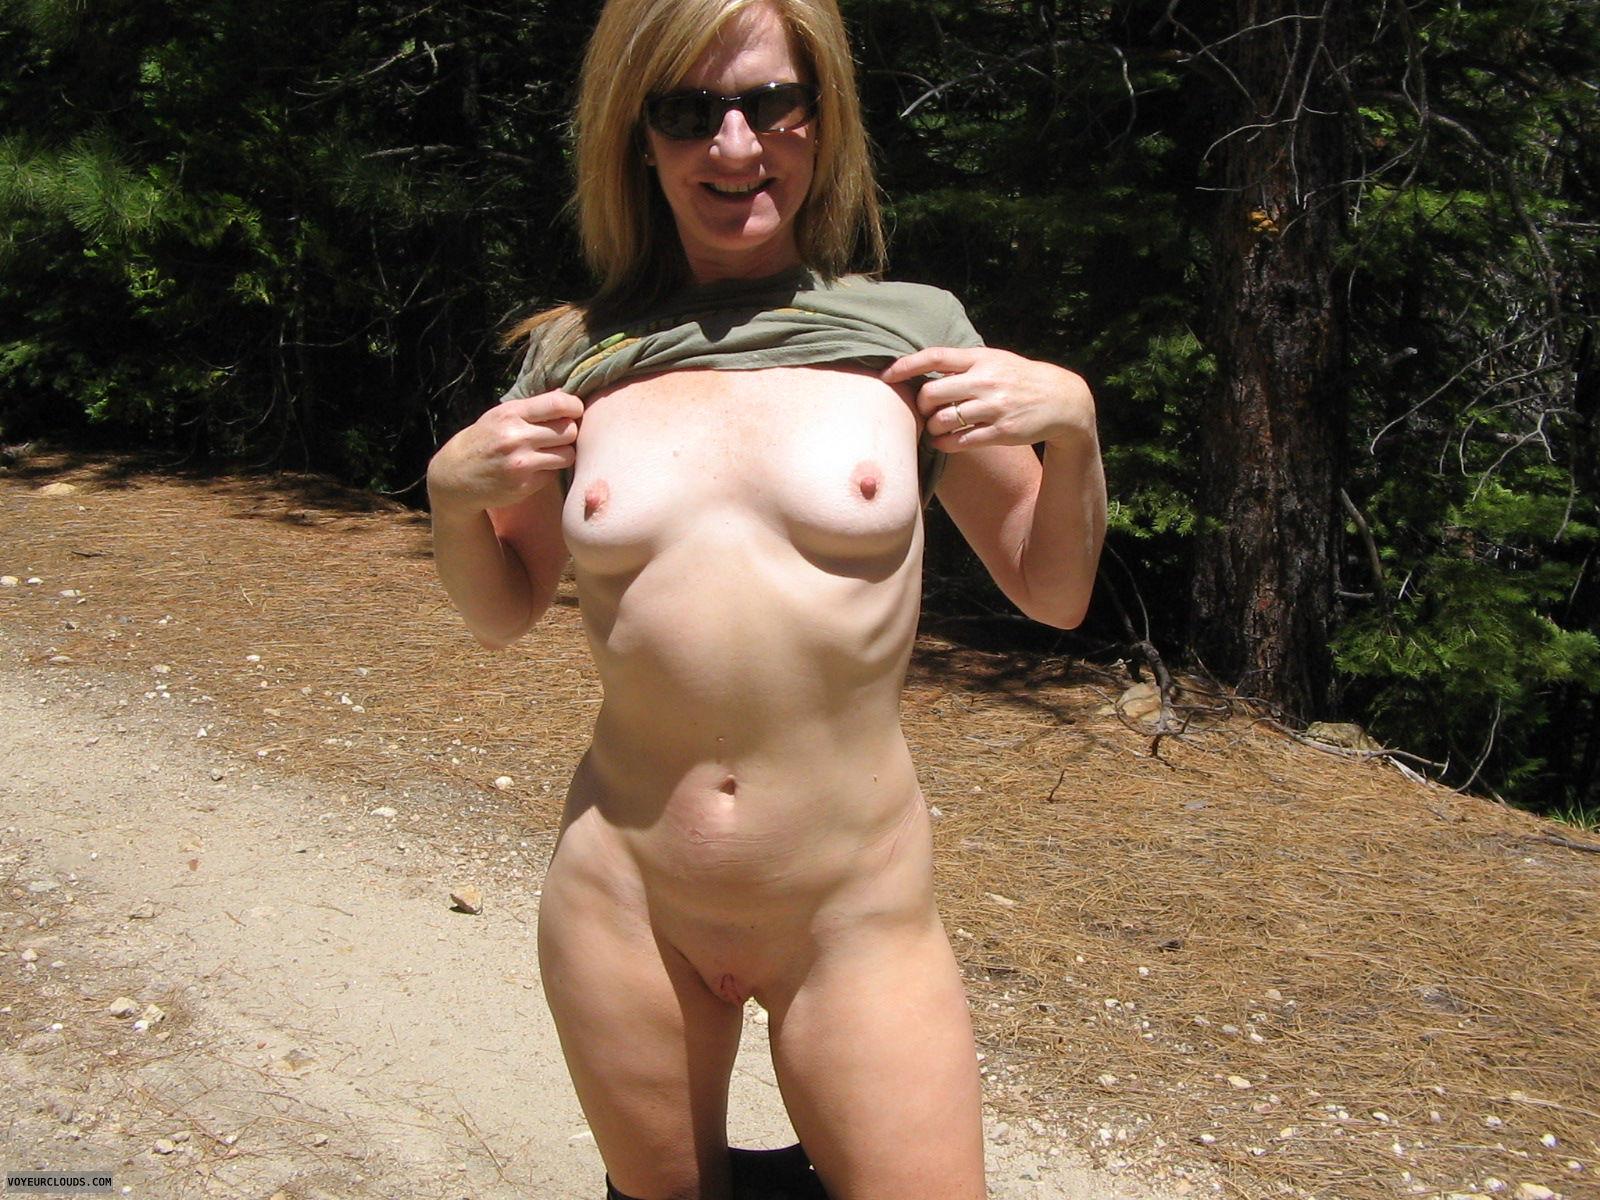 Outdoor free amateur nude